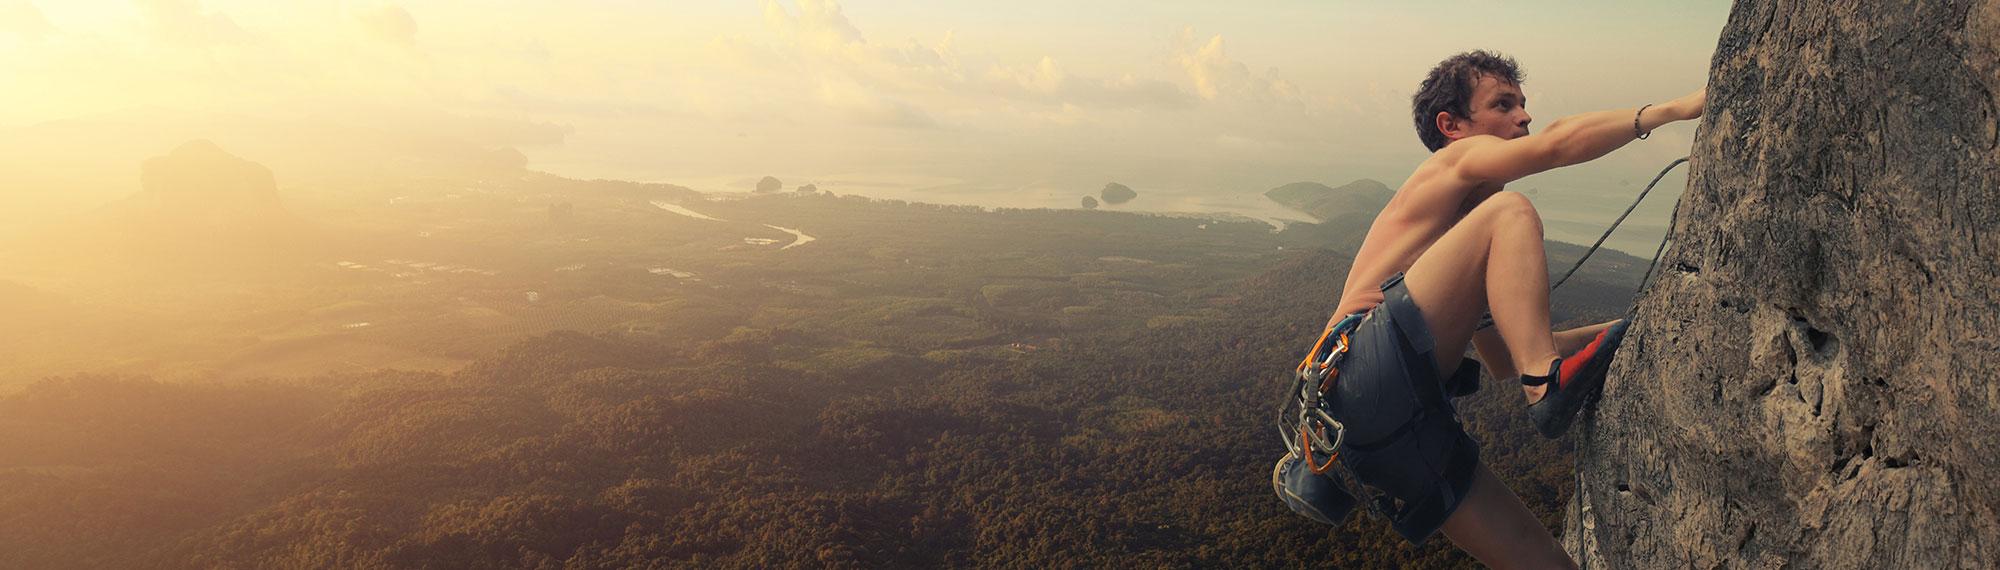 Männlicher Felskletterer klettert mit atemberaubender Landschaft den Fels hinauf